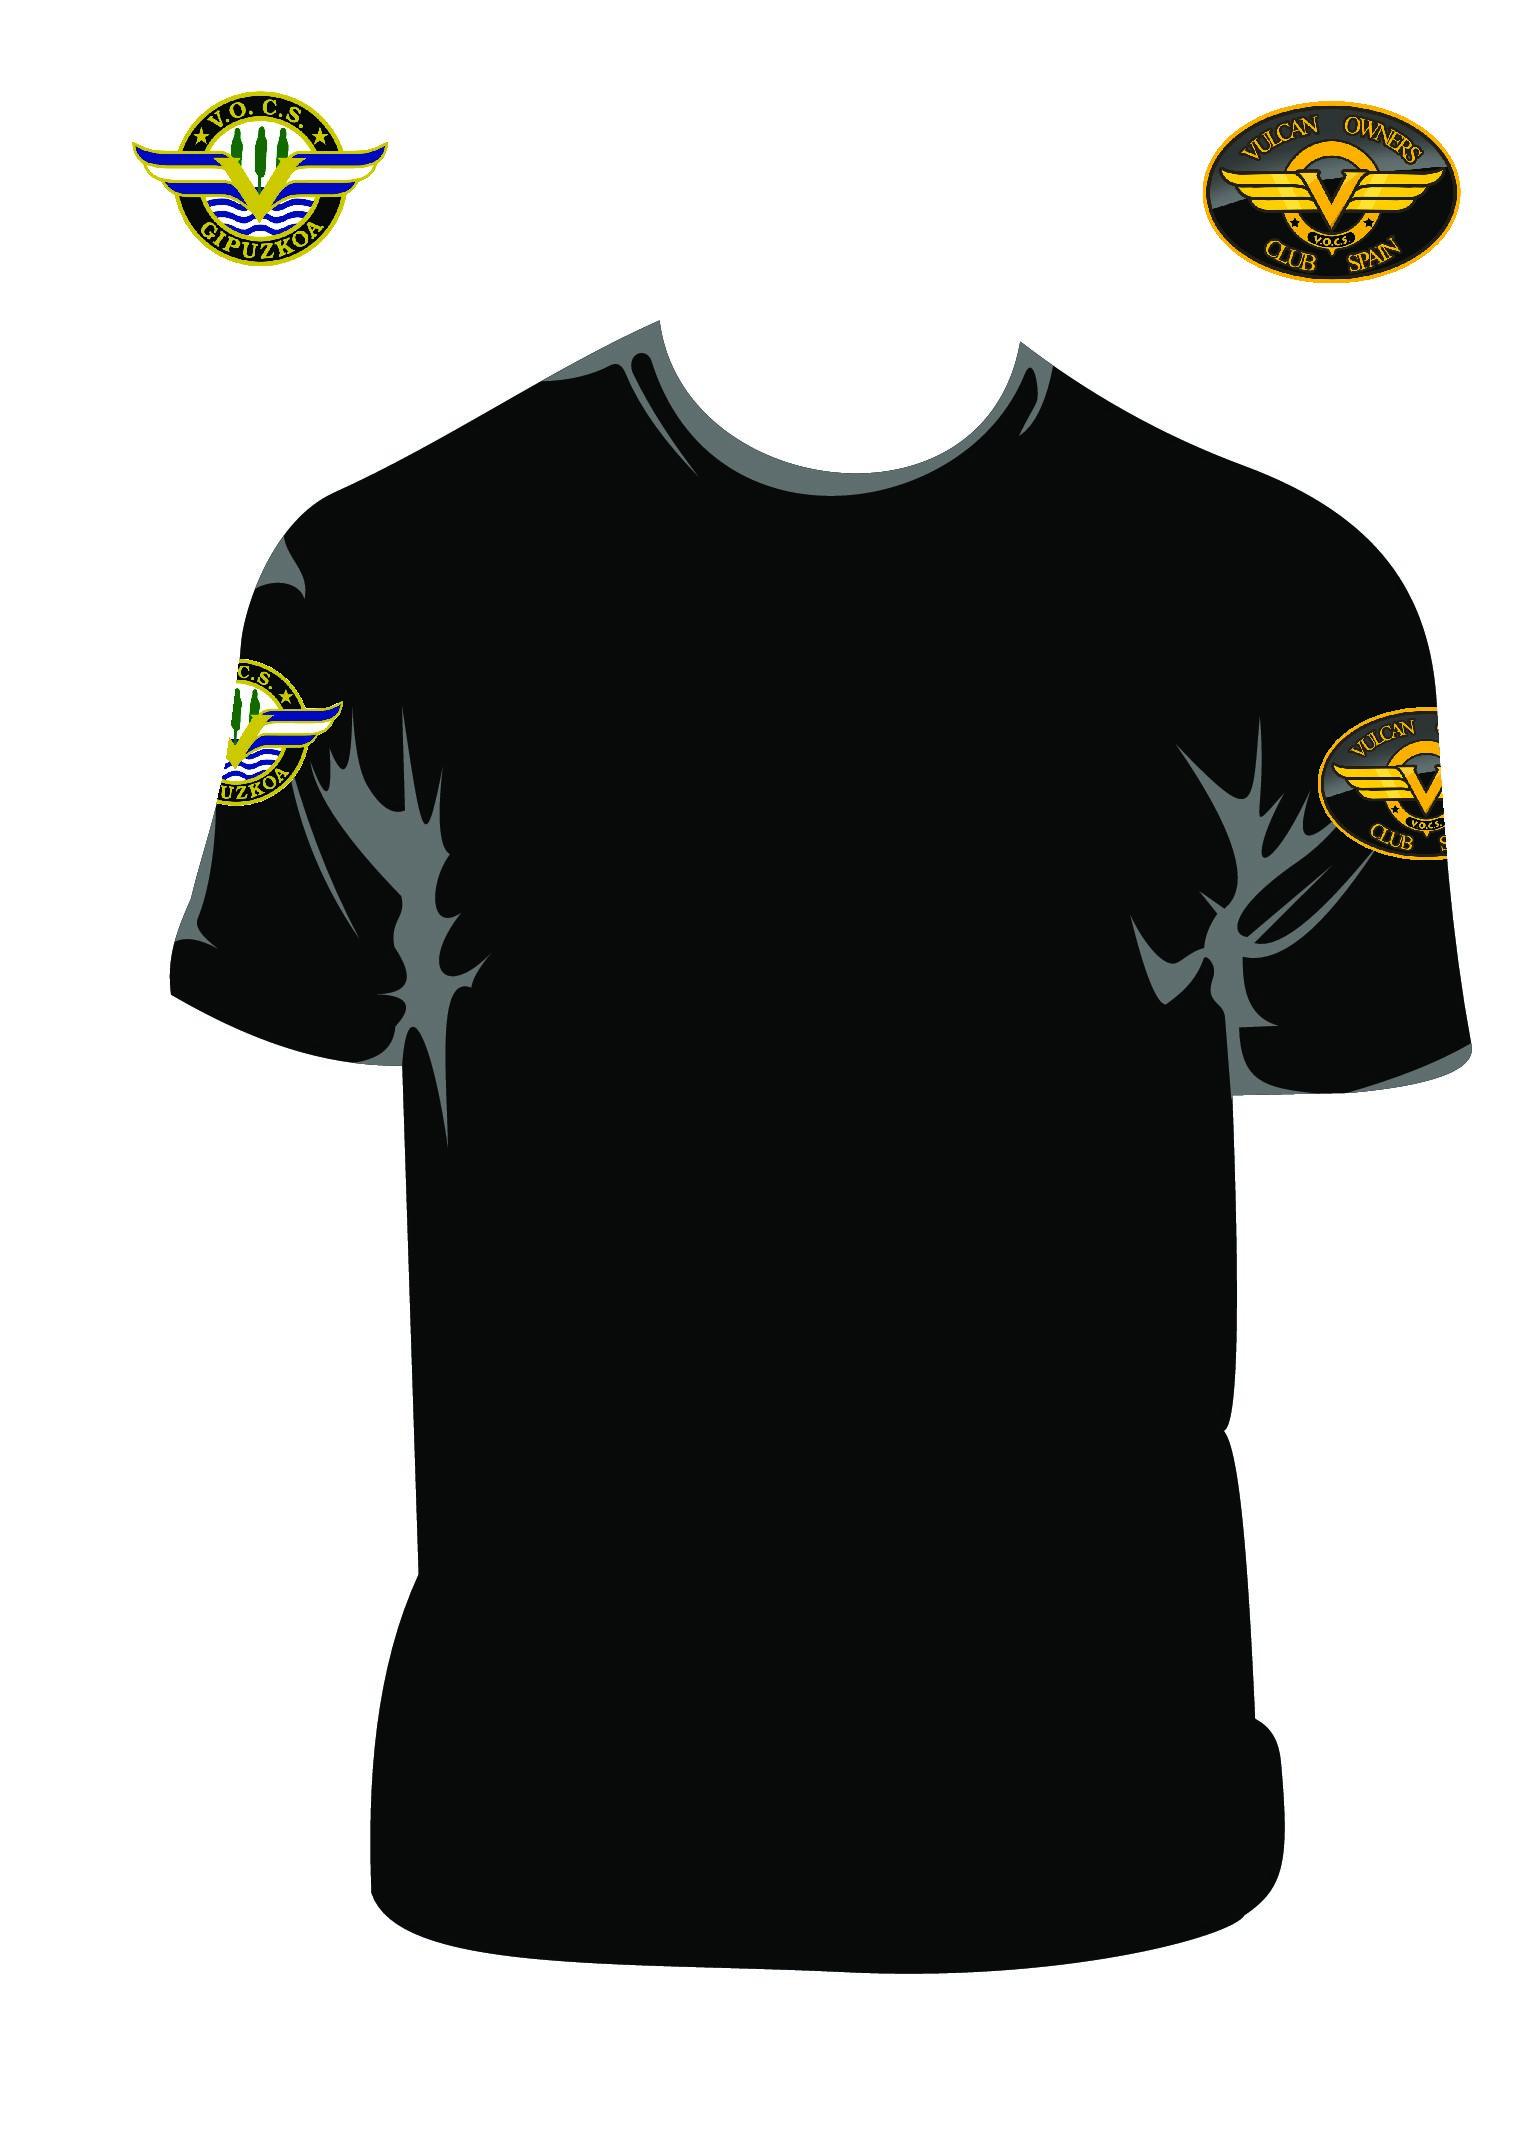 vocs VULCAN owners (camiseta mangas)